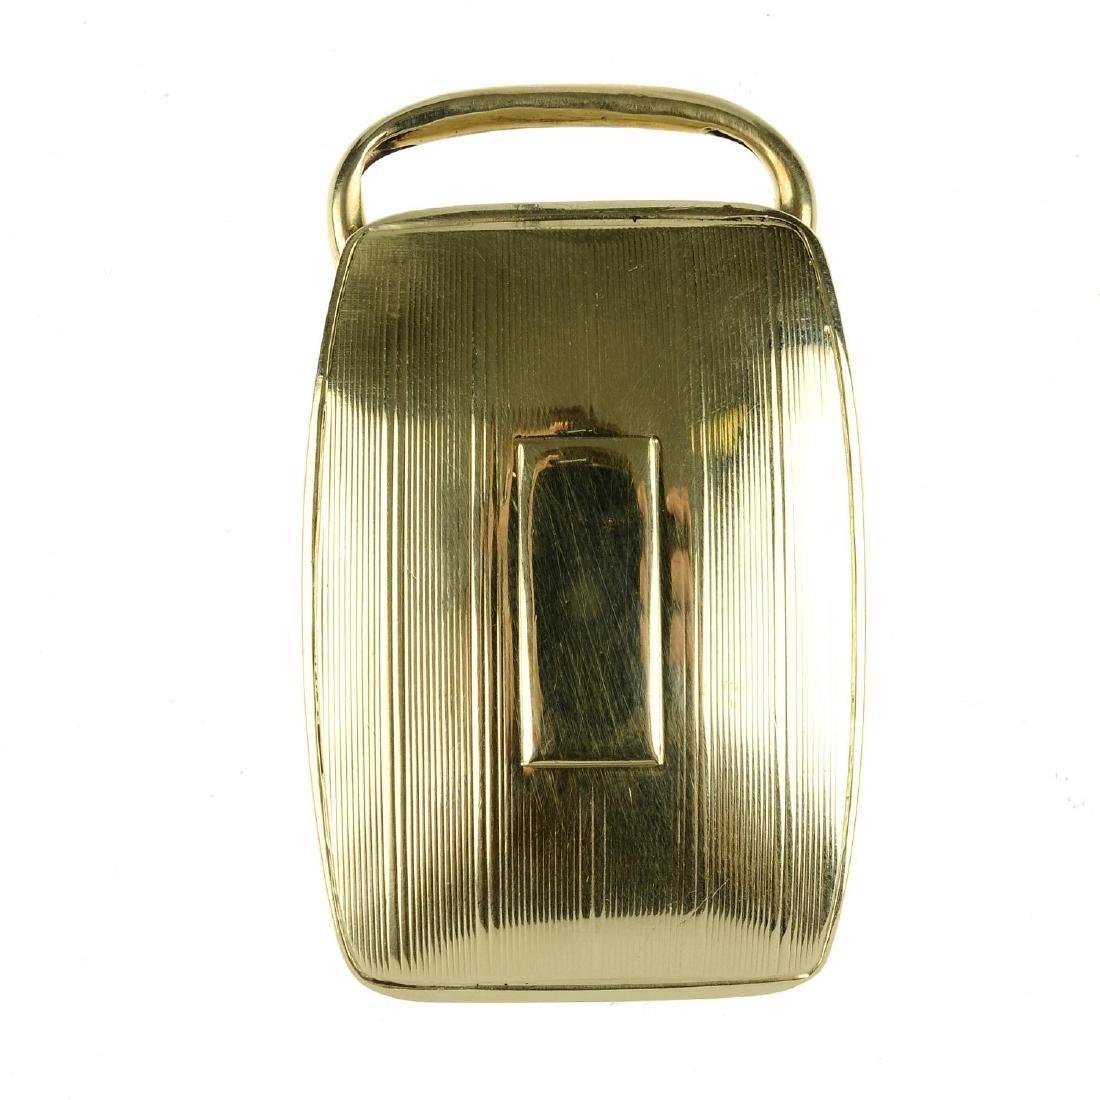 TIFFANY & CO. - a belt buckle. The rectangular buckle